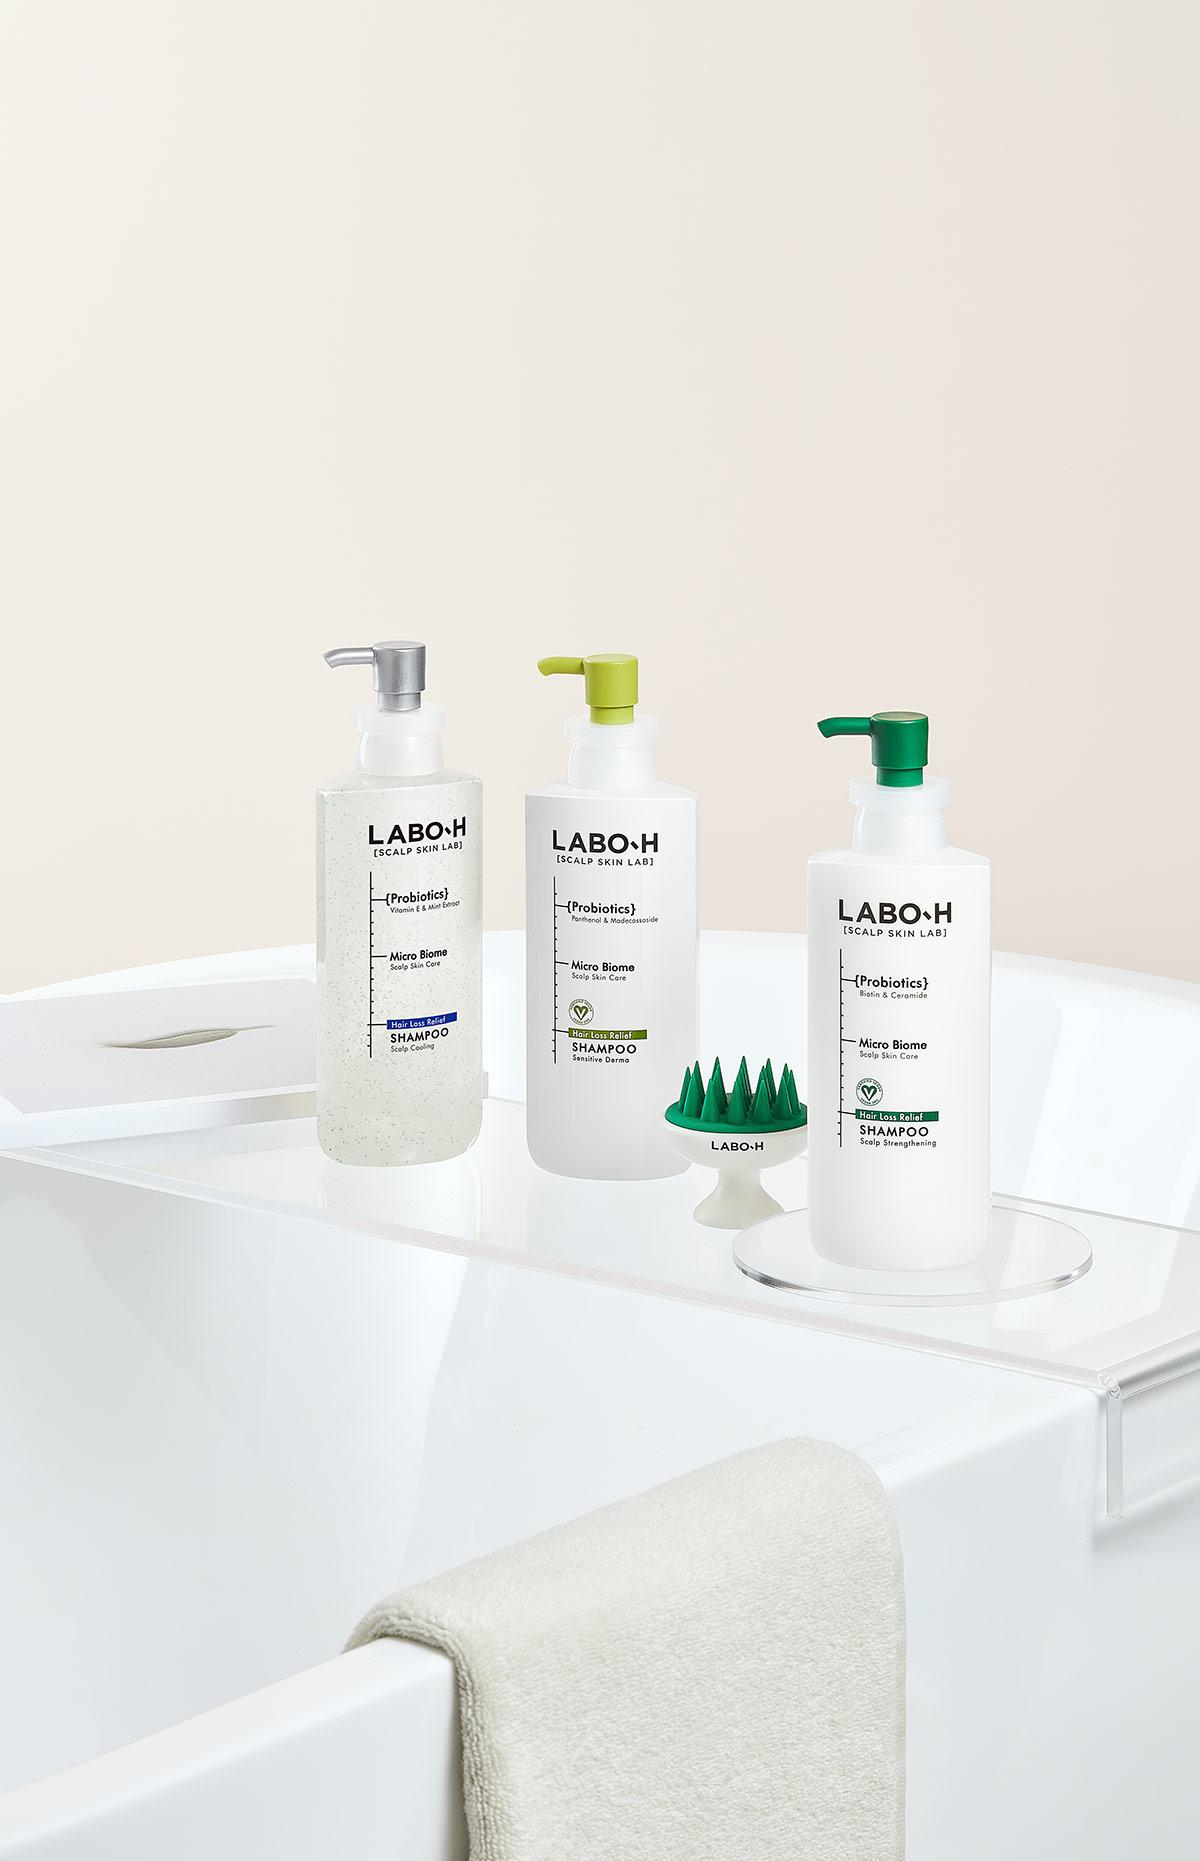 LABO-H